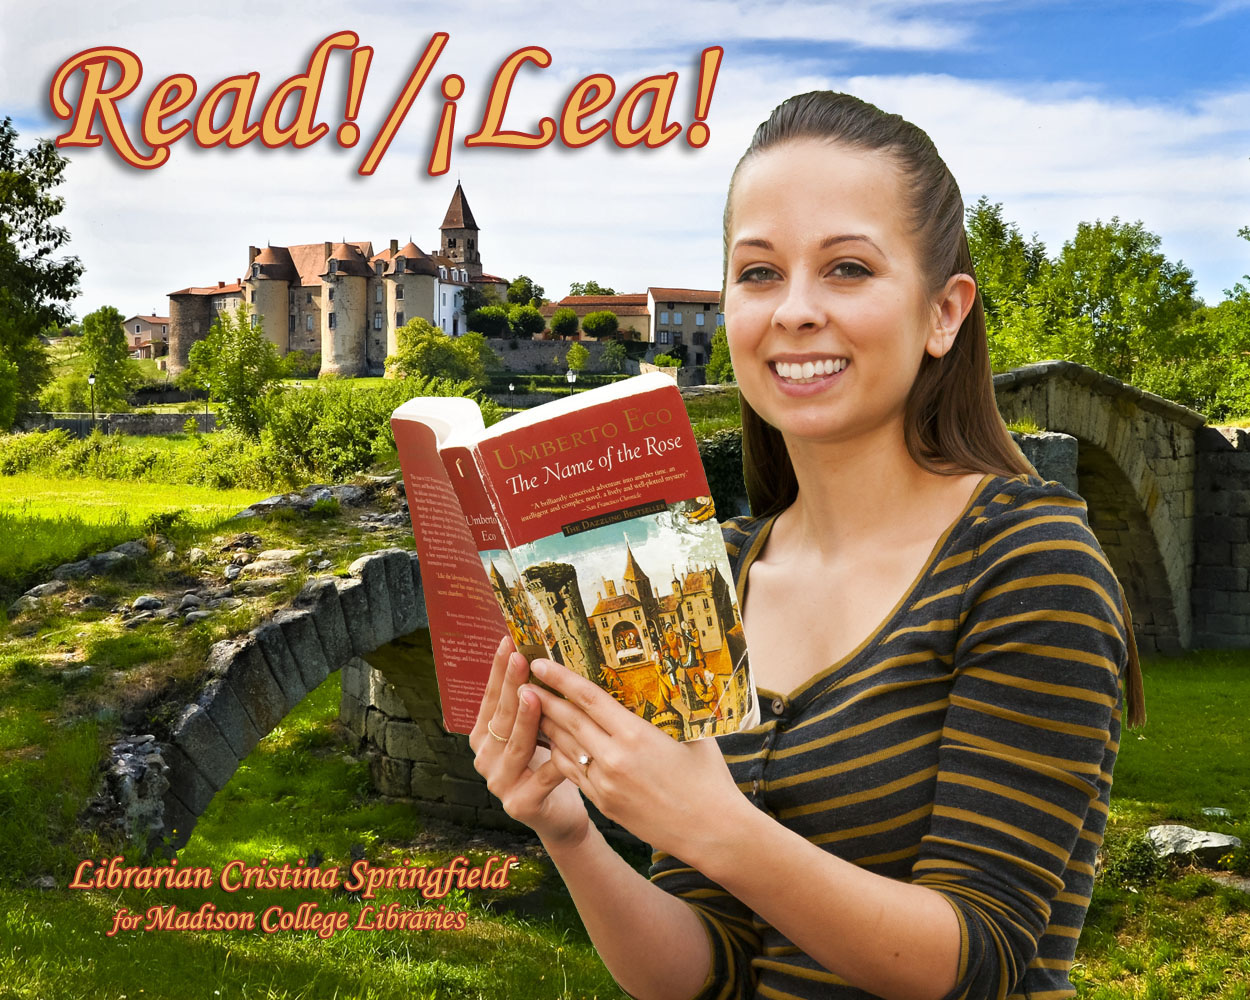 Read/!Lea! poster feature SAC Librarian Cristina Springfield